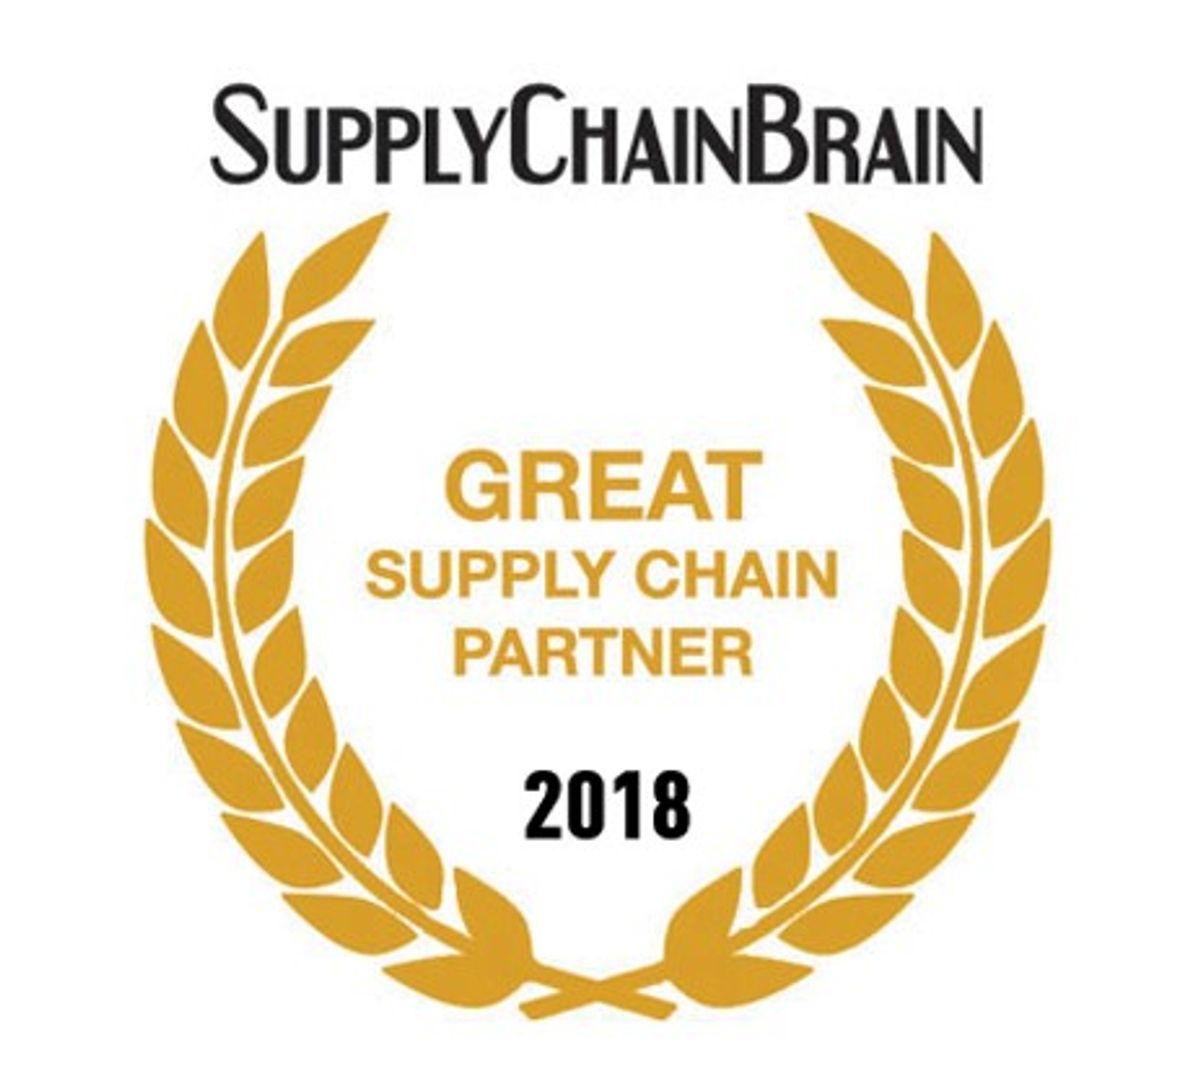 Penske Logistics is a SupplyChainBrain 2018 Great Supply Chain Partner